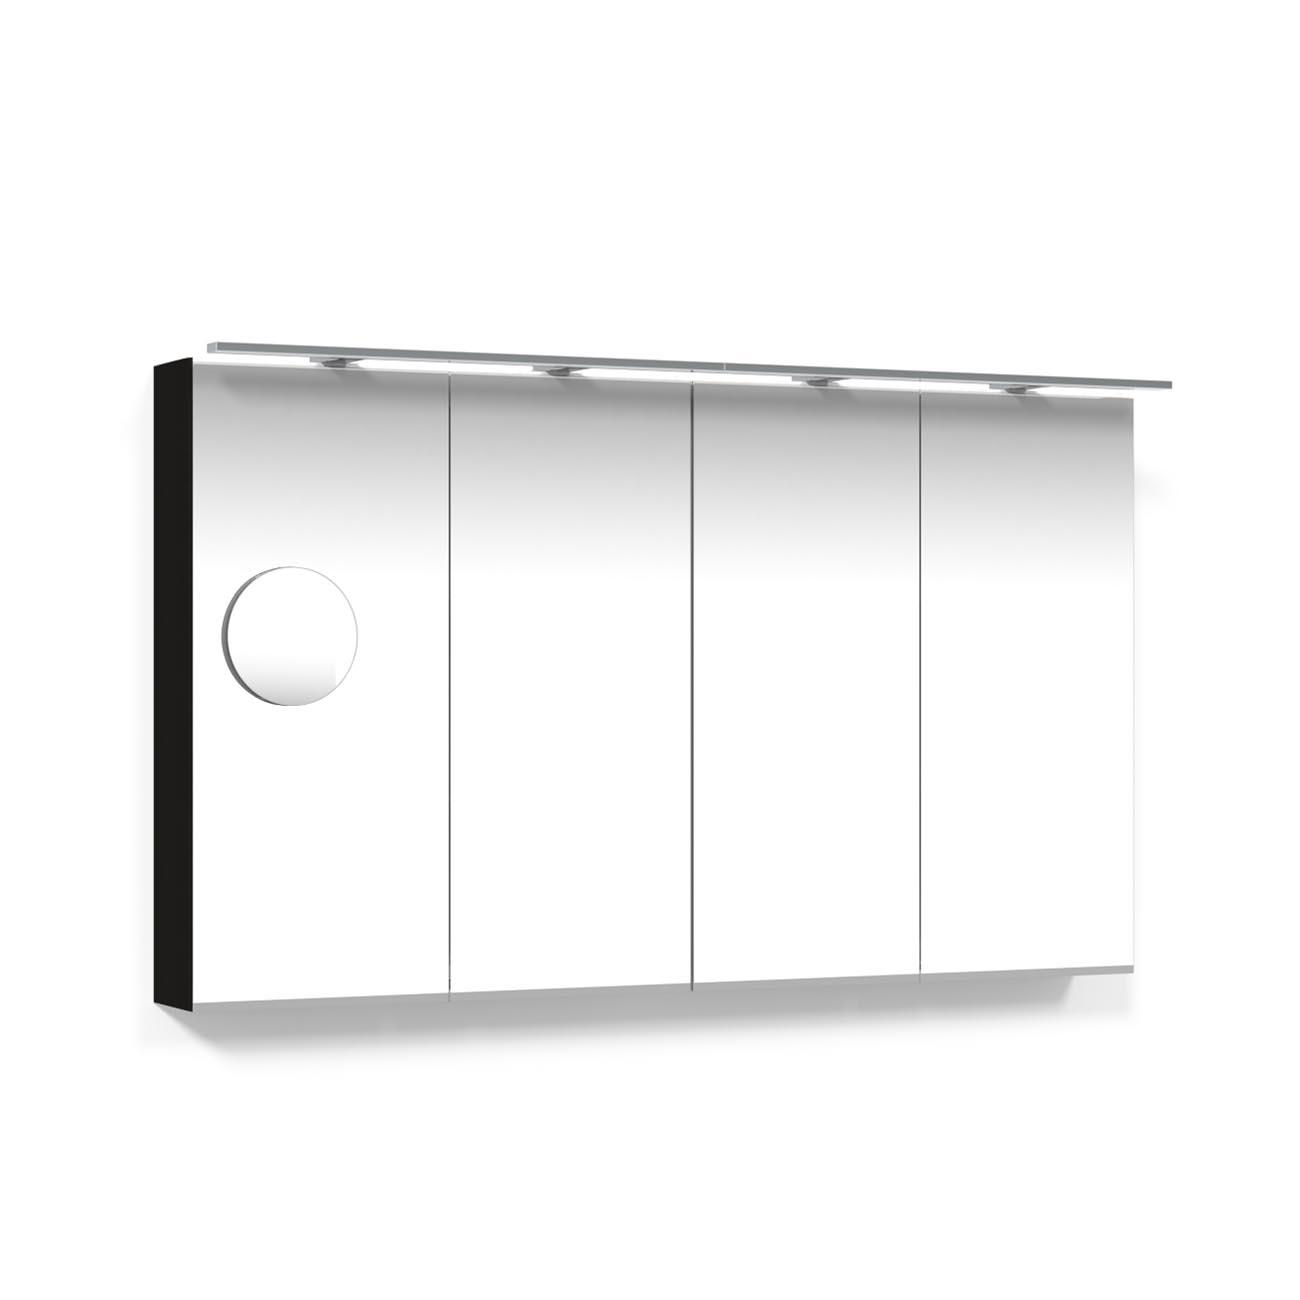 Spegelskåp Macro Design 1200 Rampbelysning LED